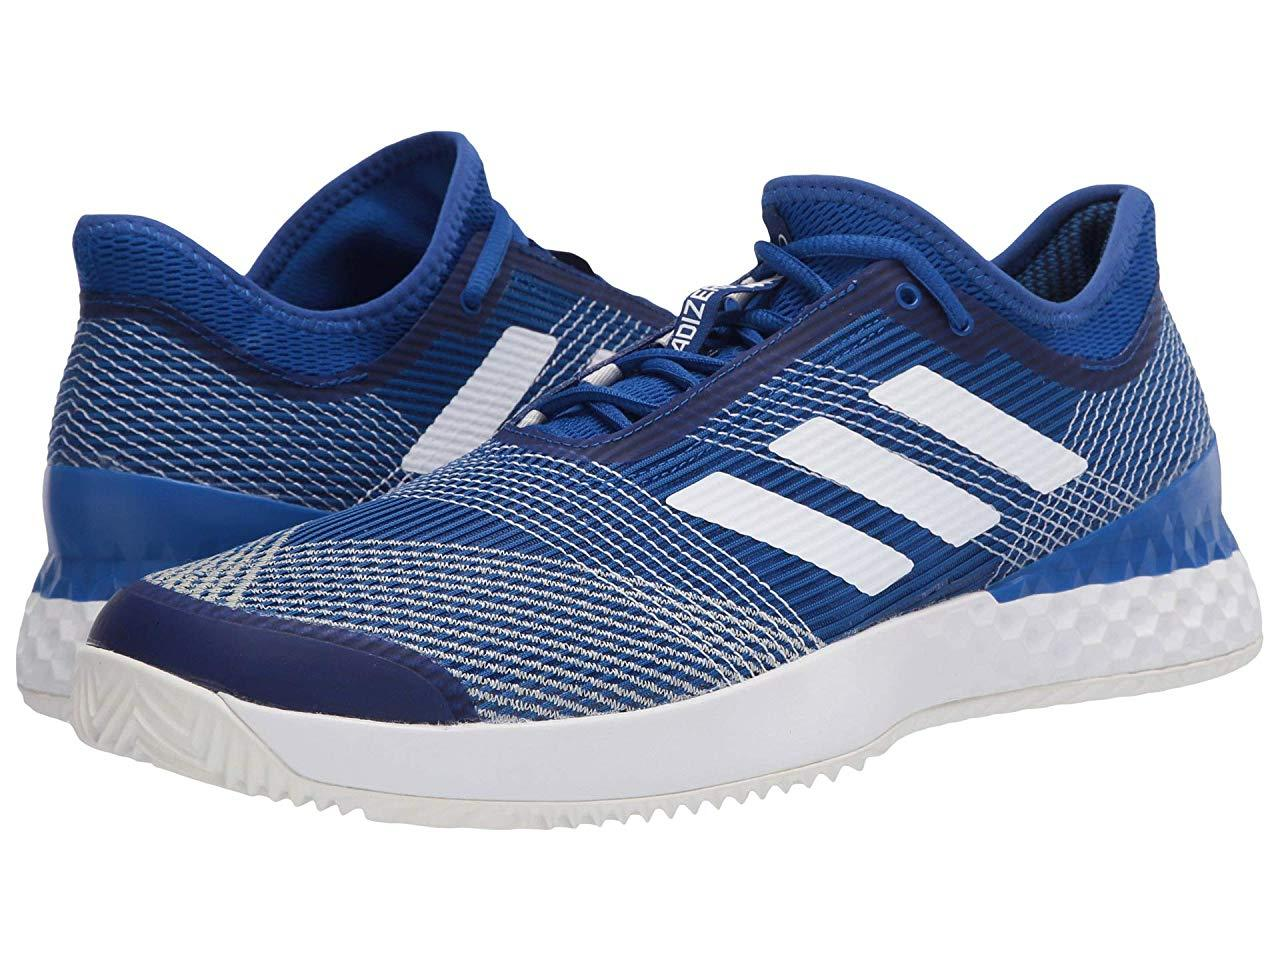 Кроссовки/Кеды adidas Adizero Ubersonic 3 Clay Team Royal Blue/Footwear White/Off-White